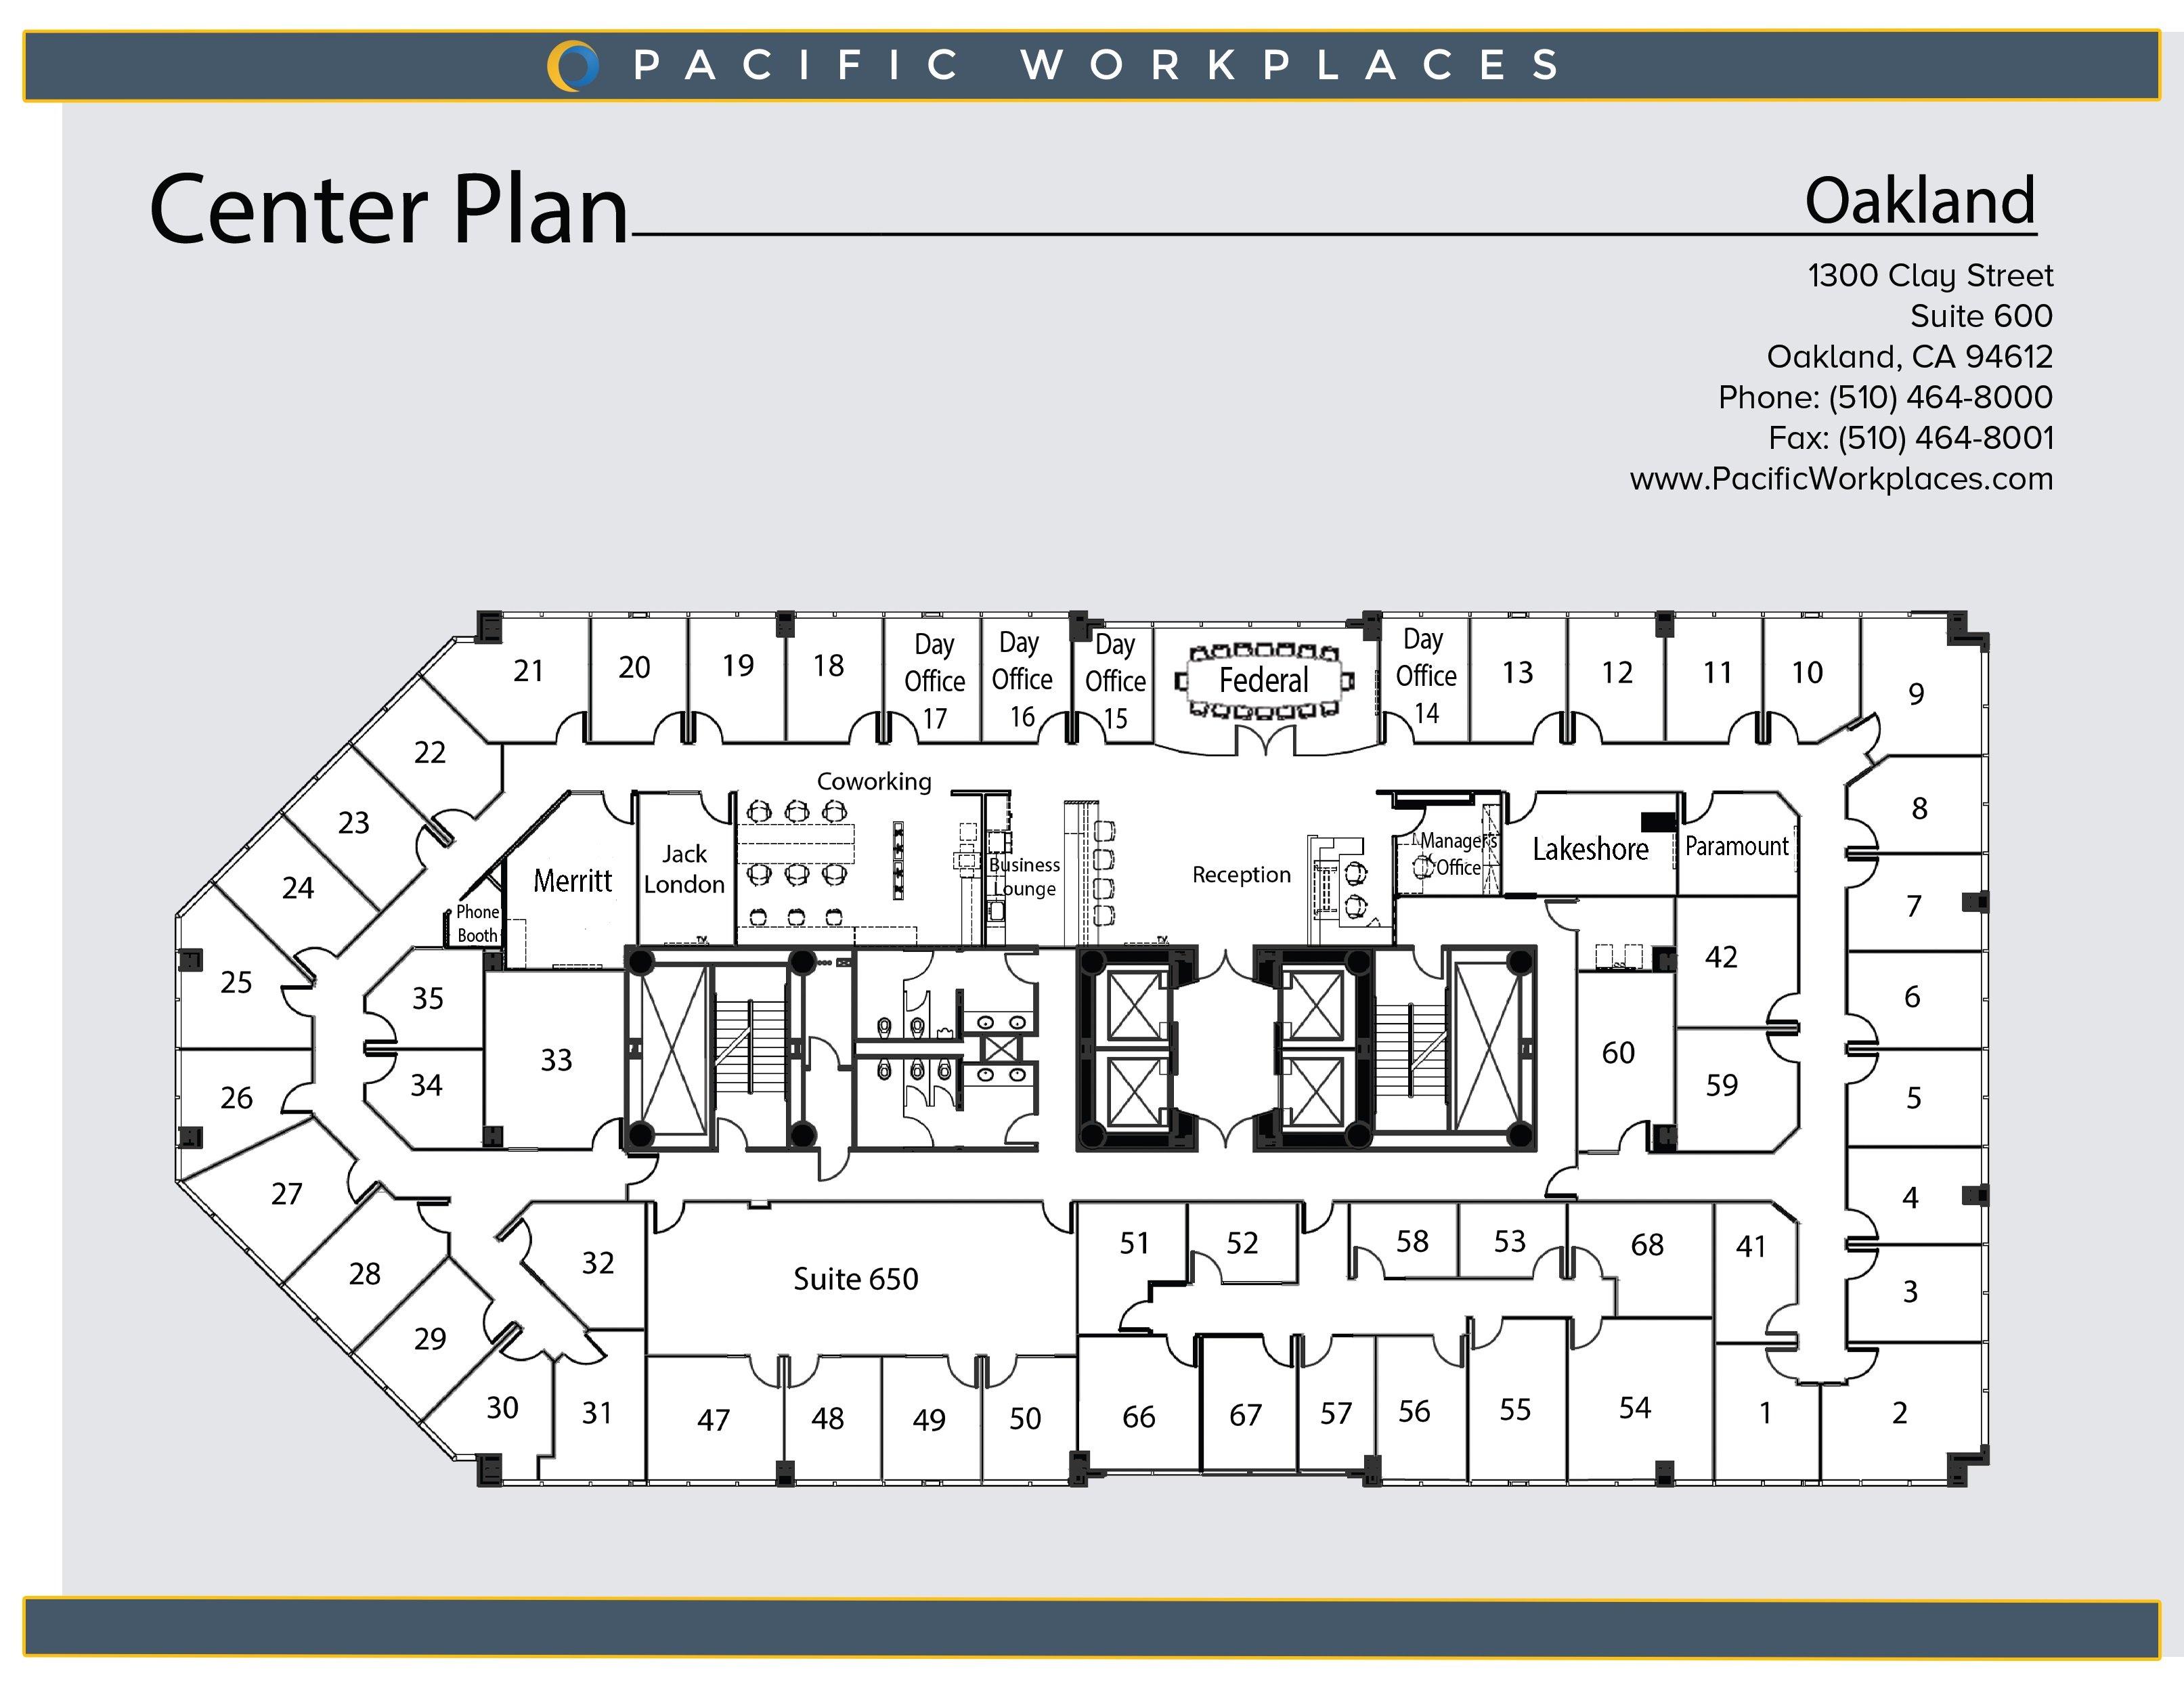 Pacific Workplaces Oakland Floor Plan 052620